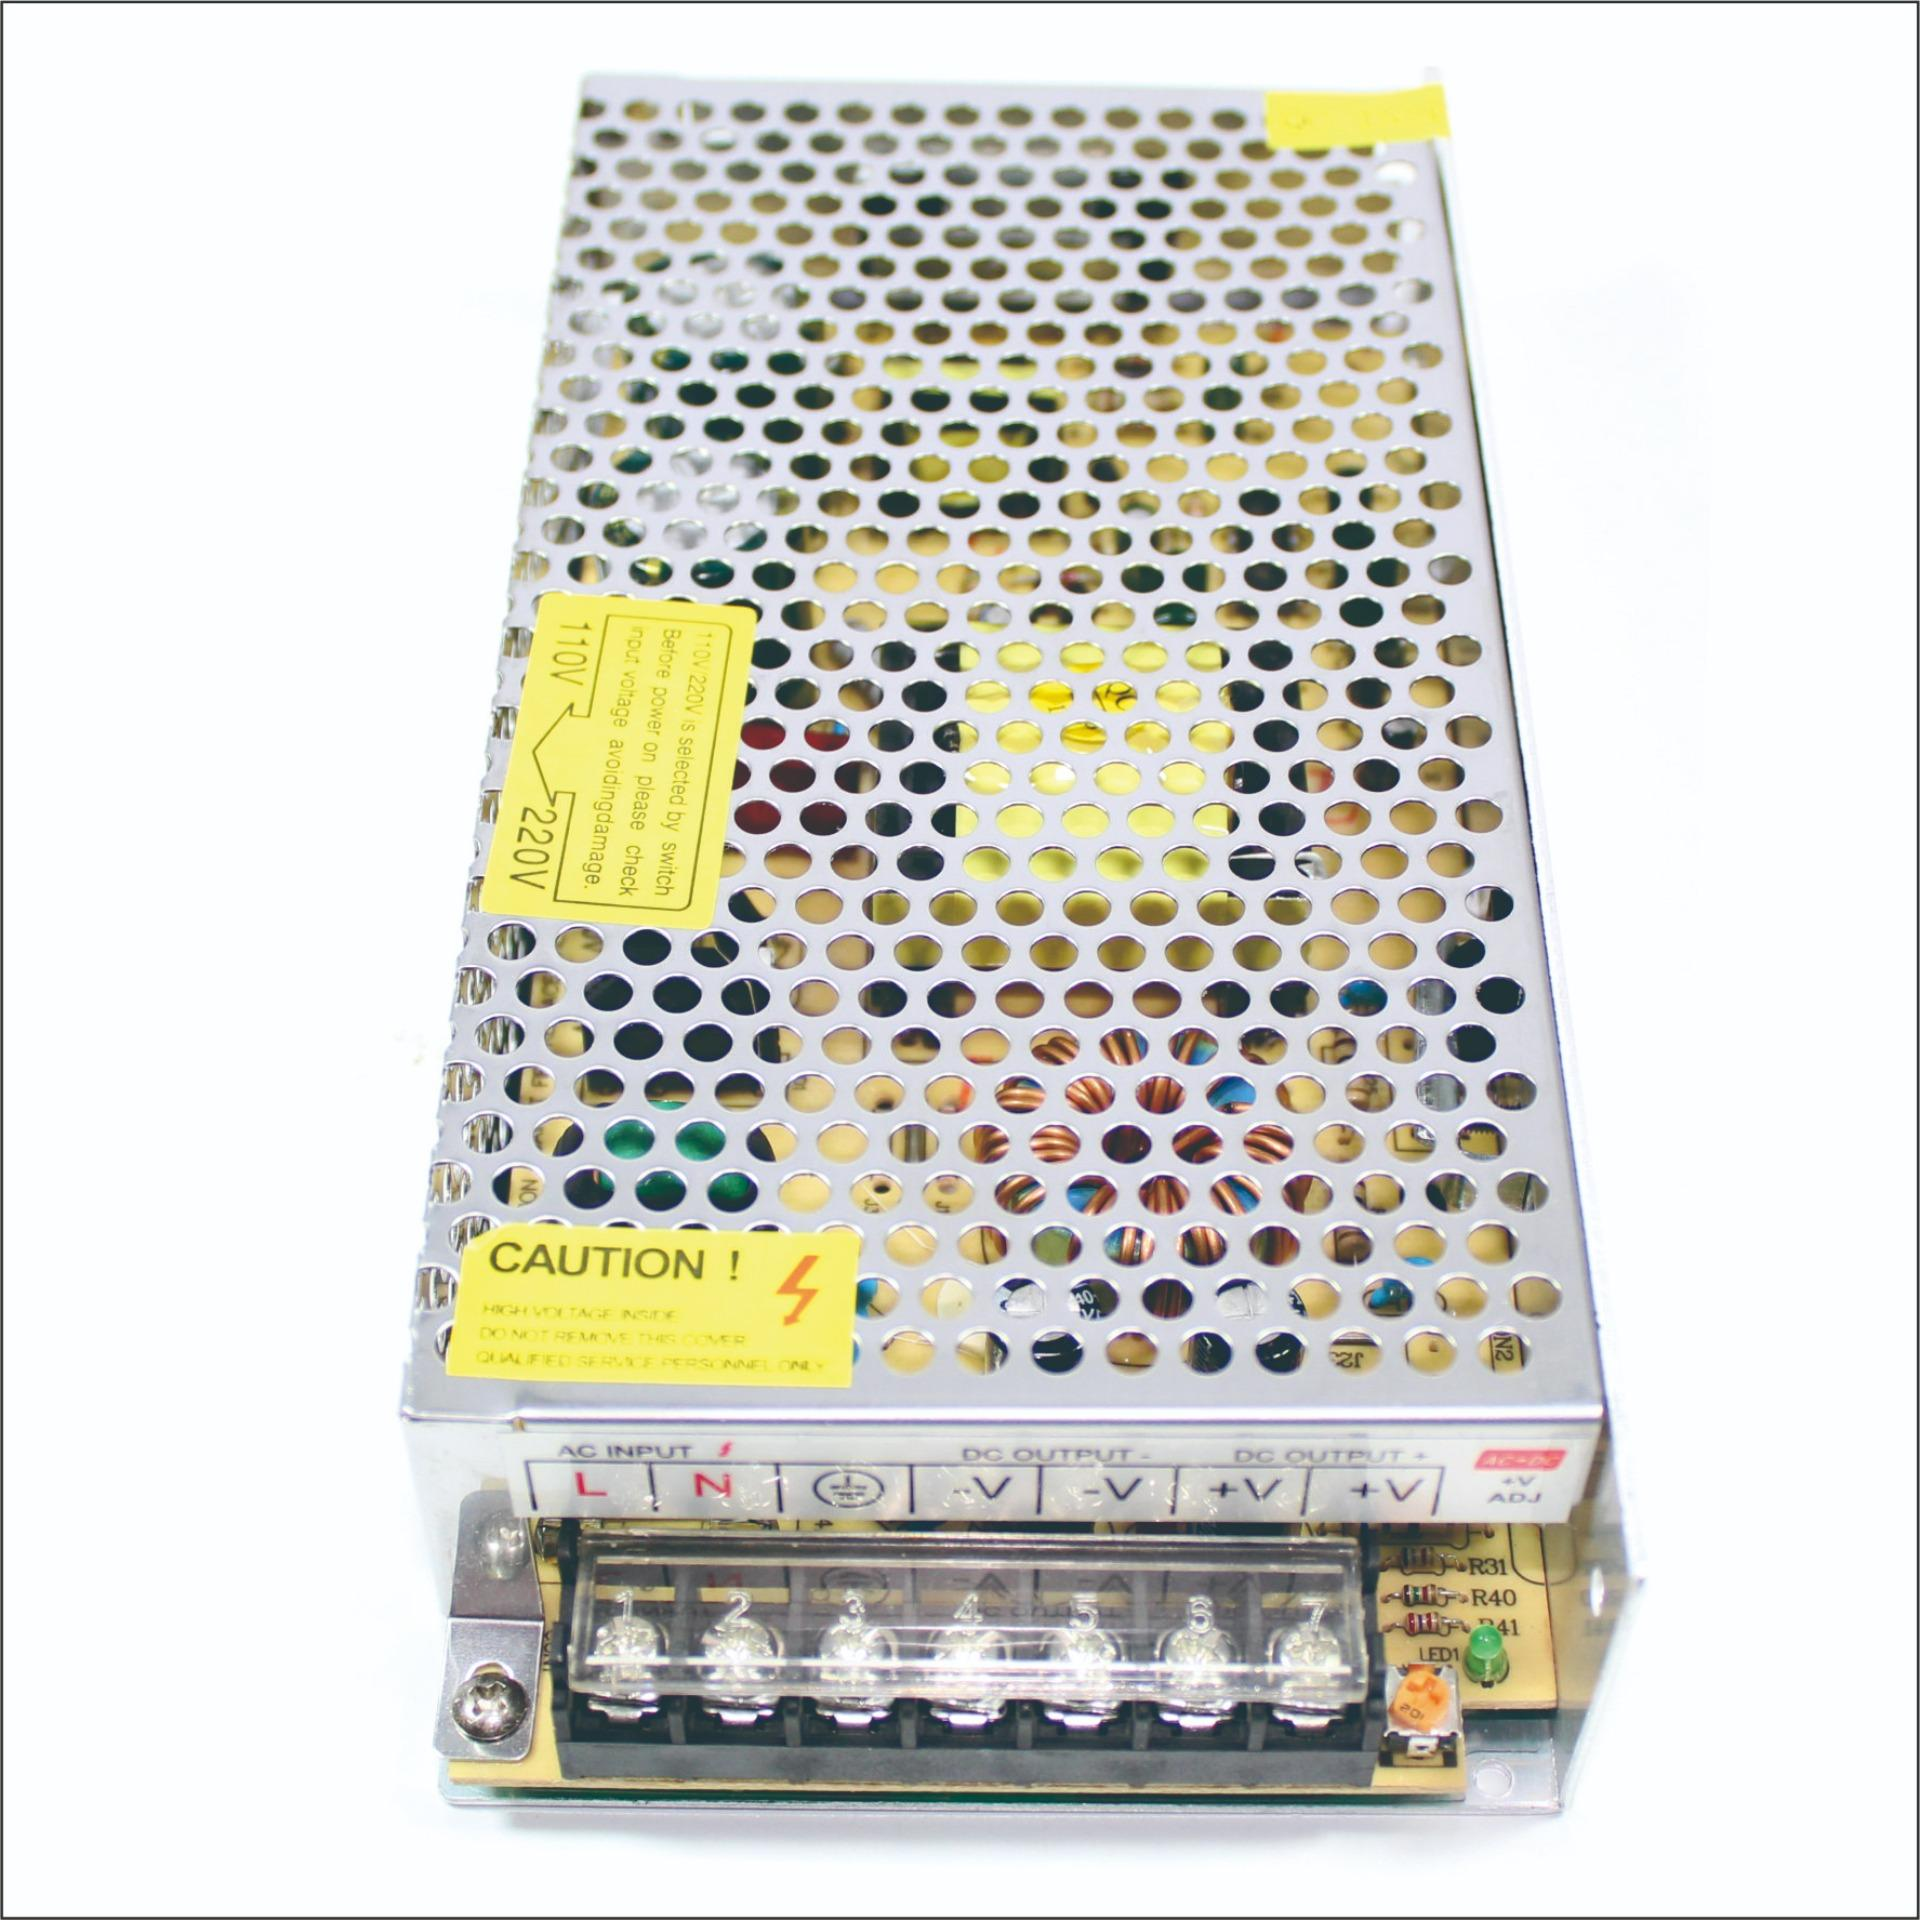 weitech switching power supply/ travo 10a/ hl-120-12